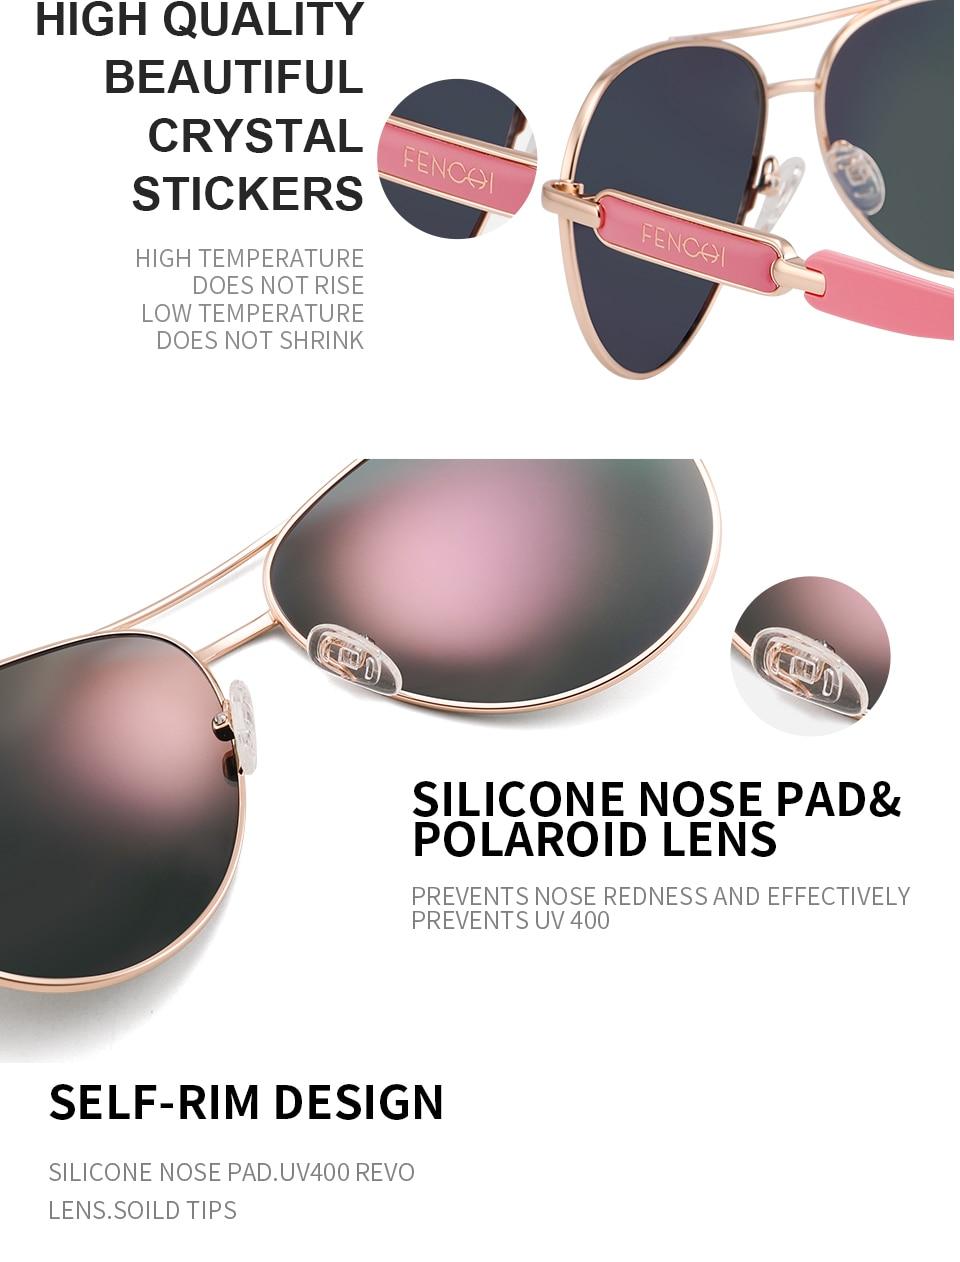 H7180447a80824875b9370d137456481fj FENCHI Polarized Sunglasses Women Vintage Brand Glasses Driving Pilot Pink Mirror sunglasses Men ladies oculos de sol feminino